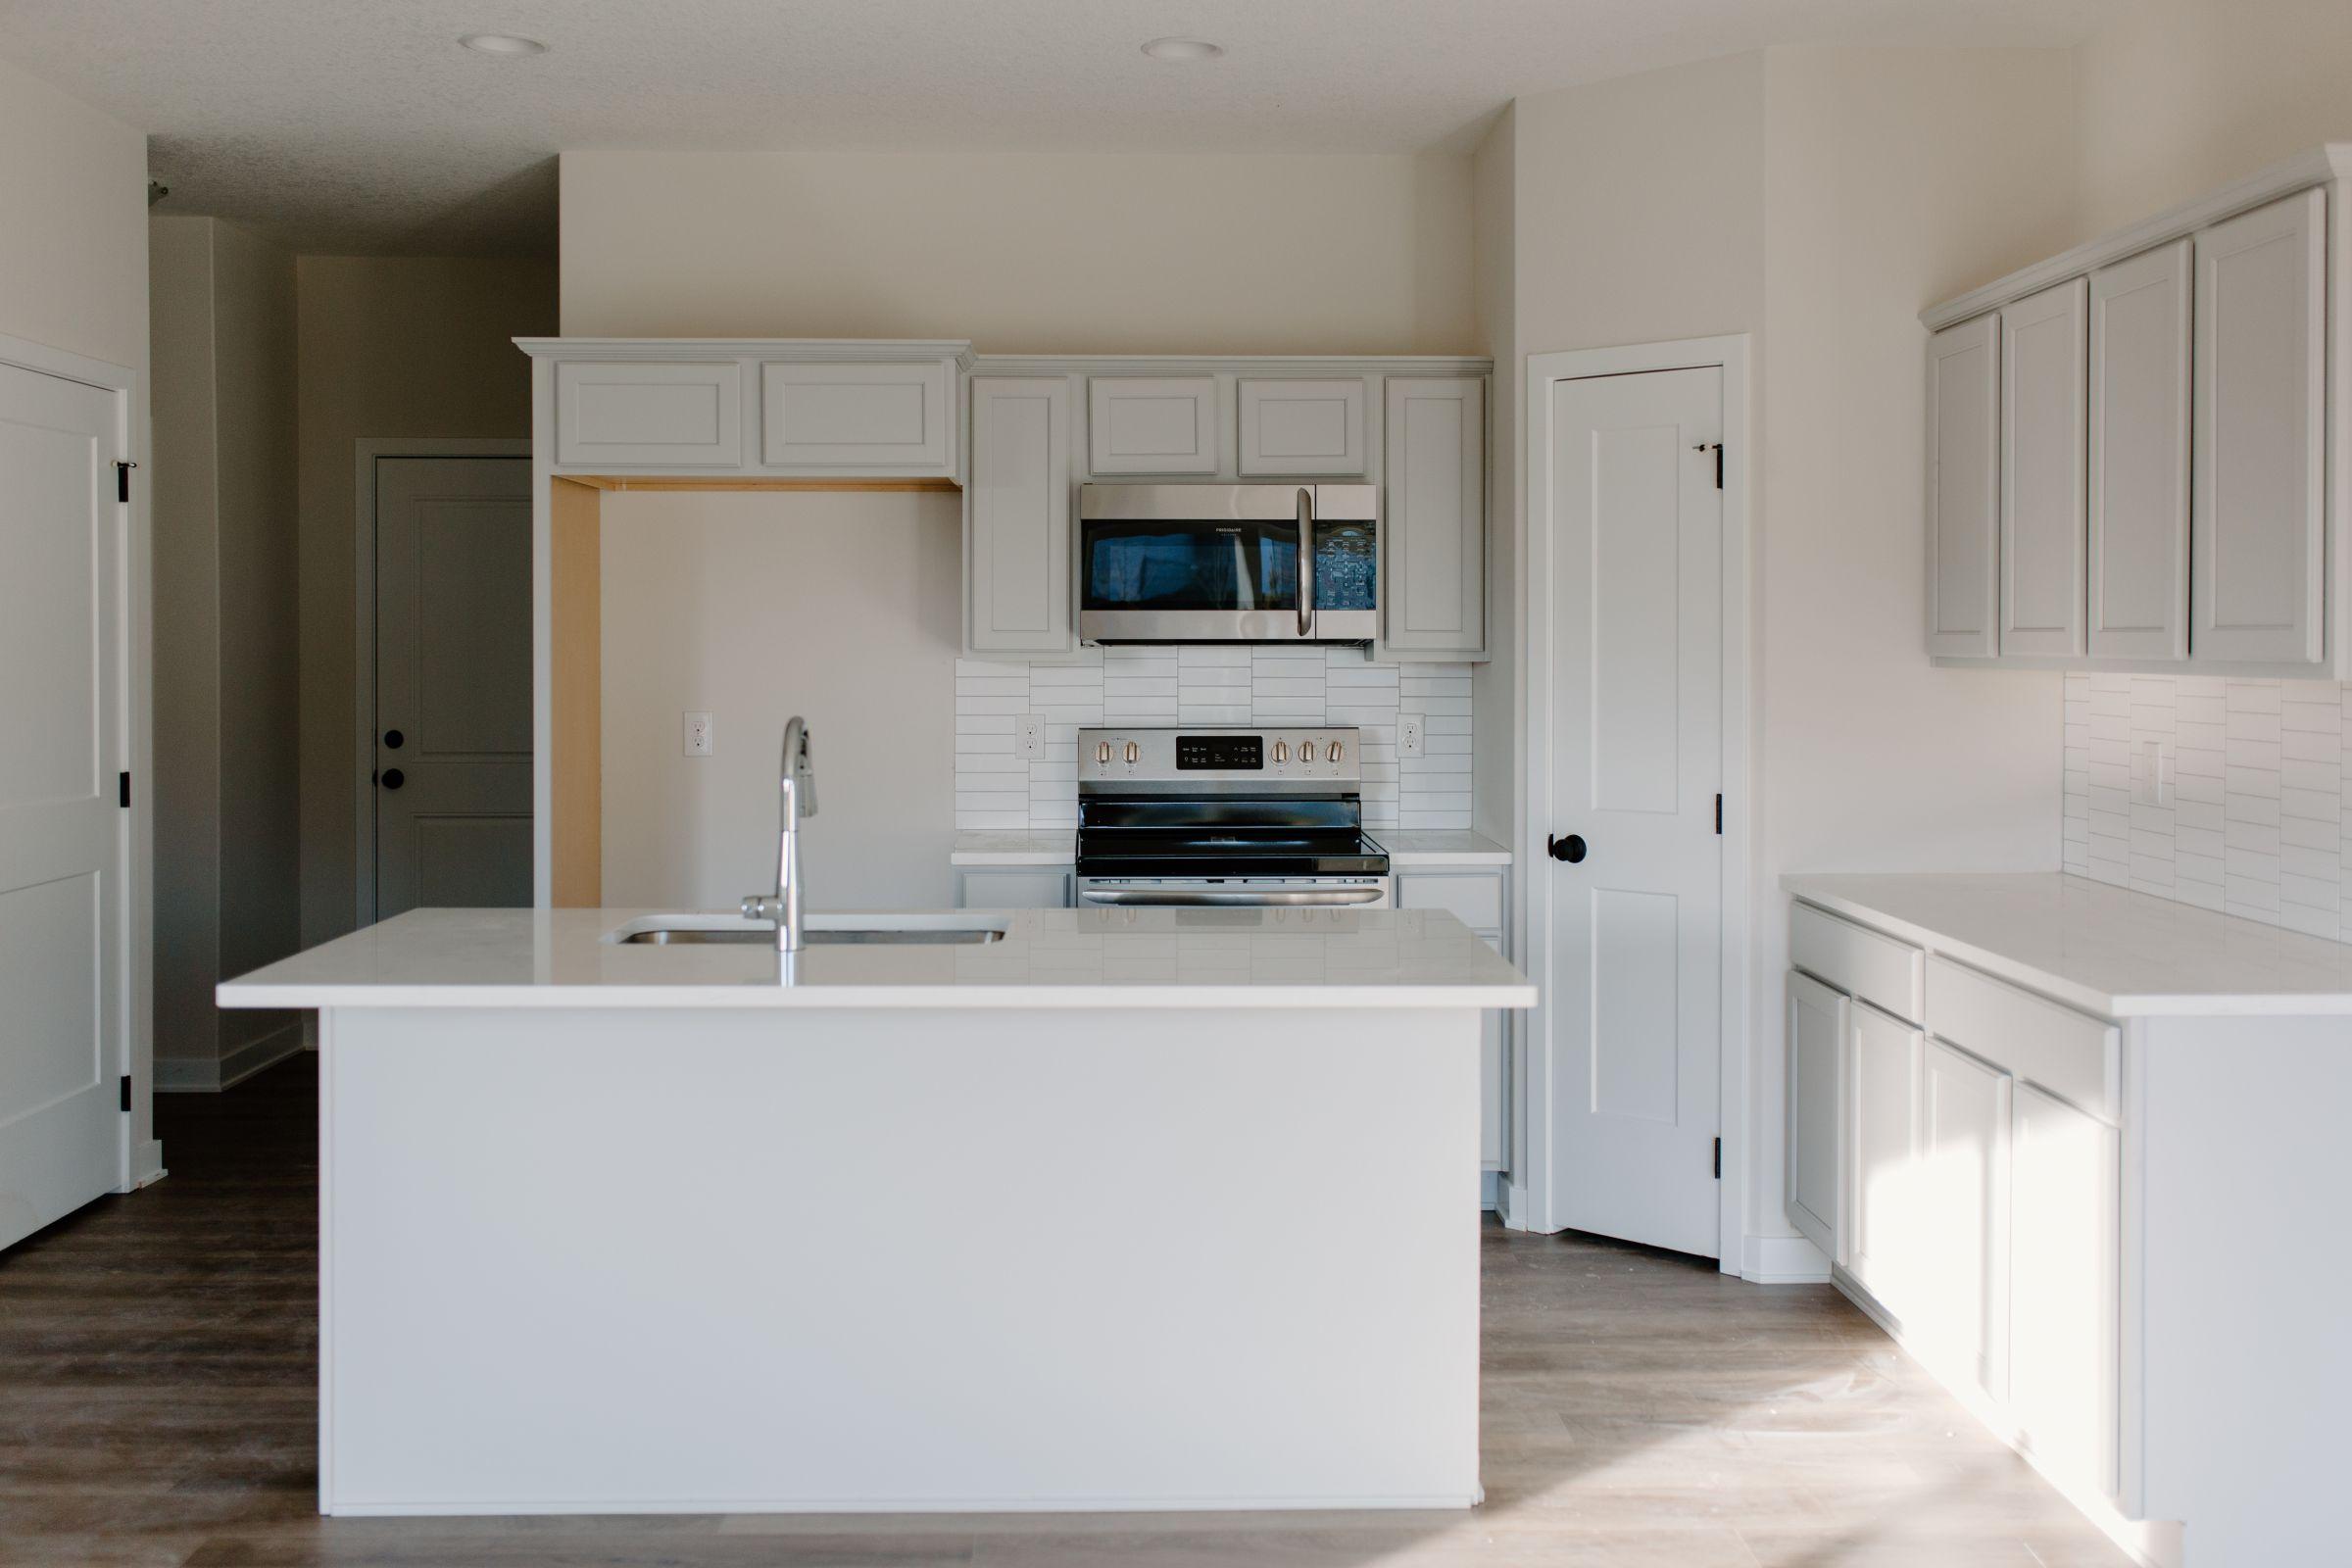 residential-warren-county-iowa-0-acres-listing-number-15366-2-2021-02-18-165311.jpg